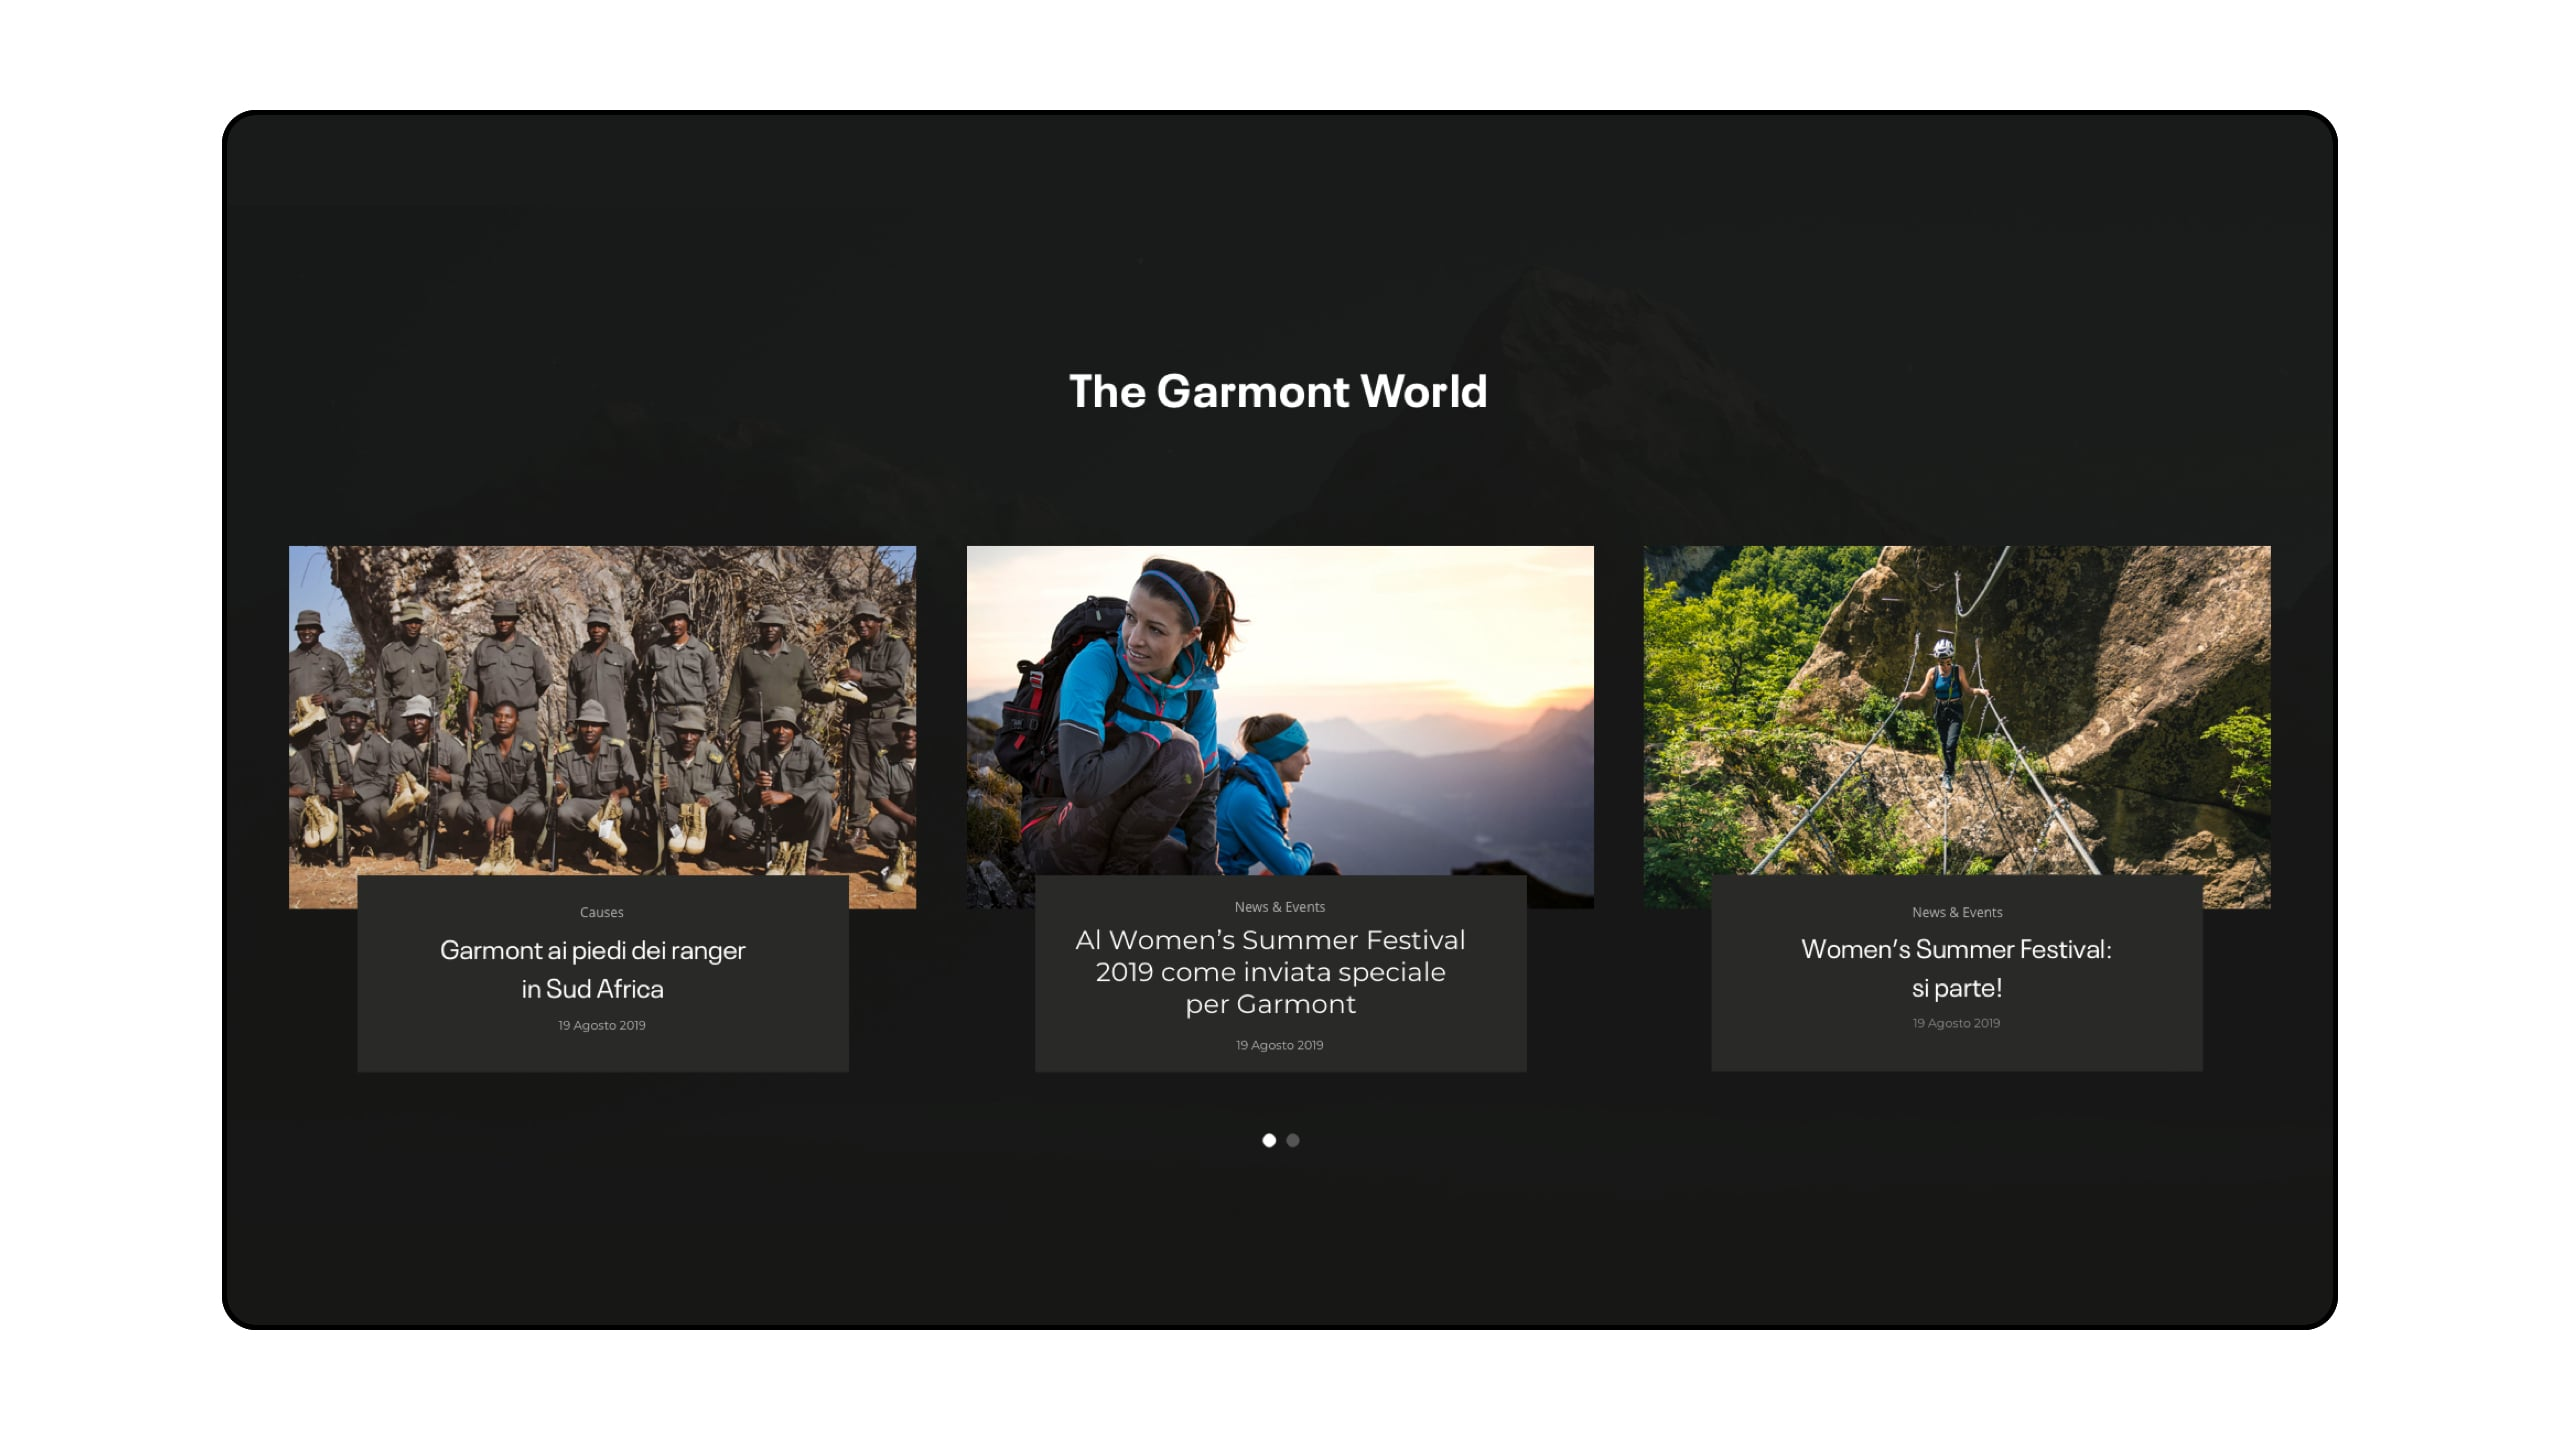 The Garmont World desktop